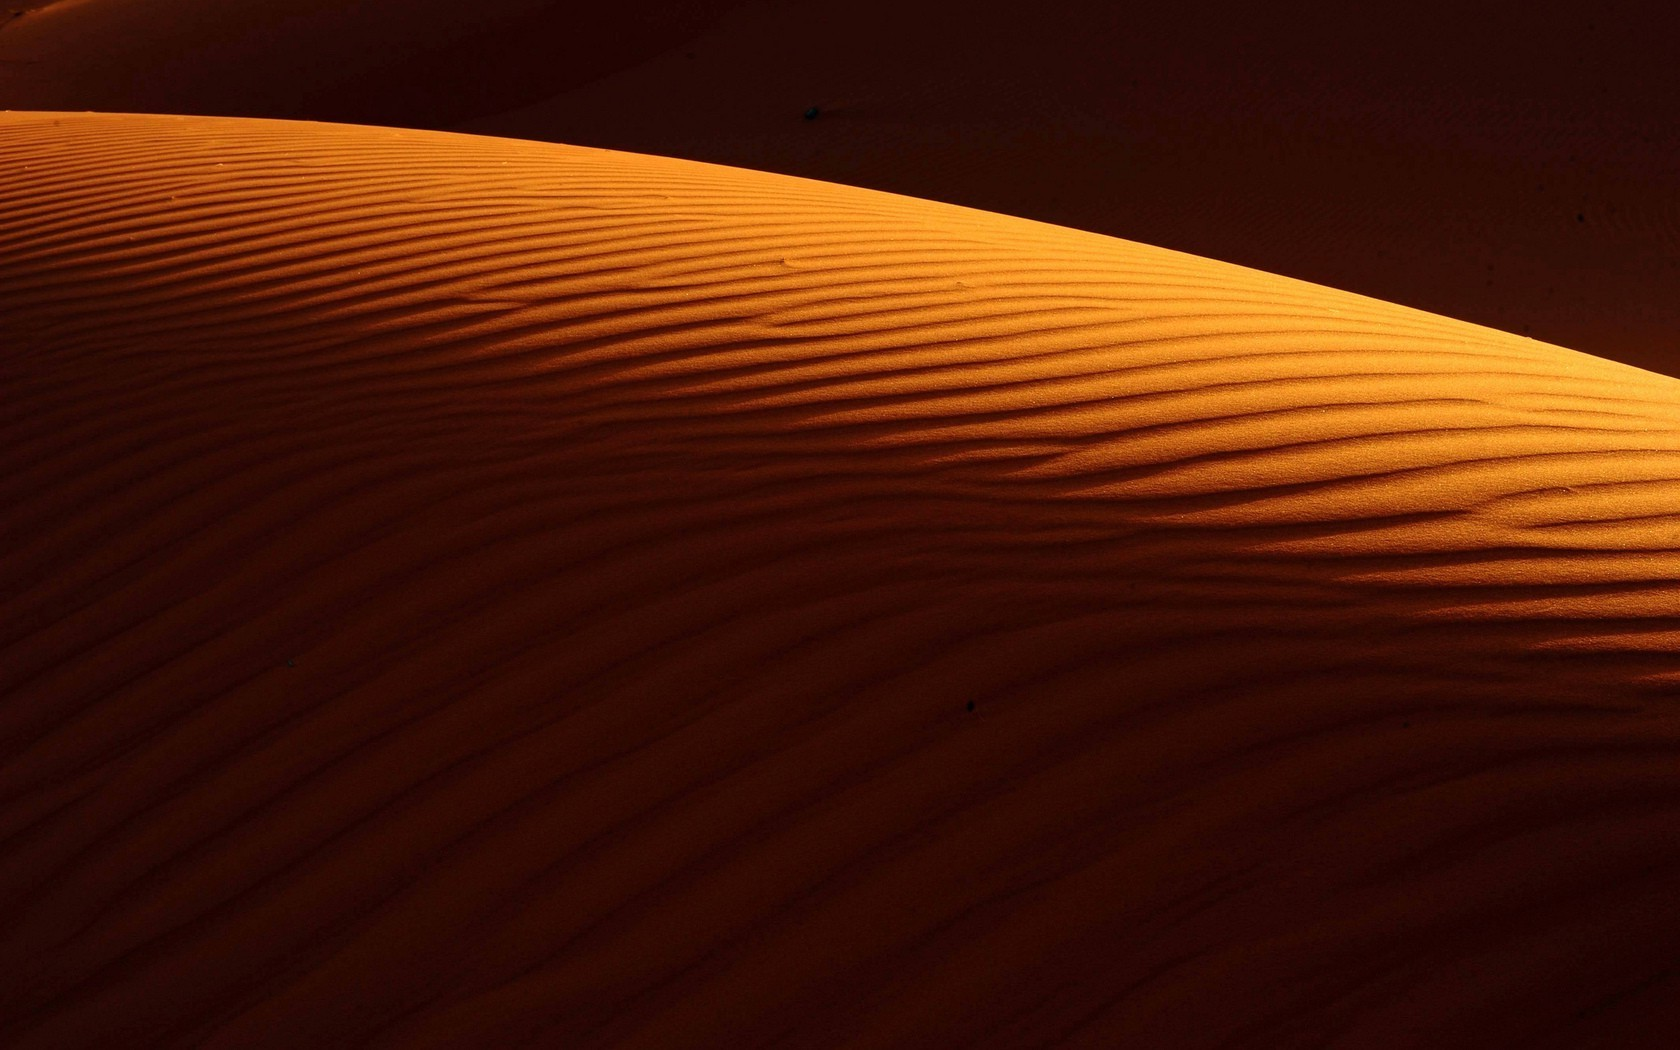 барханы пустыня дюны  № 1291895 бесплатно